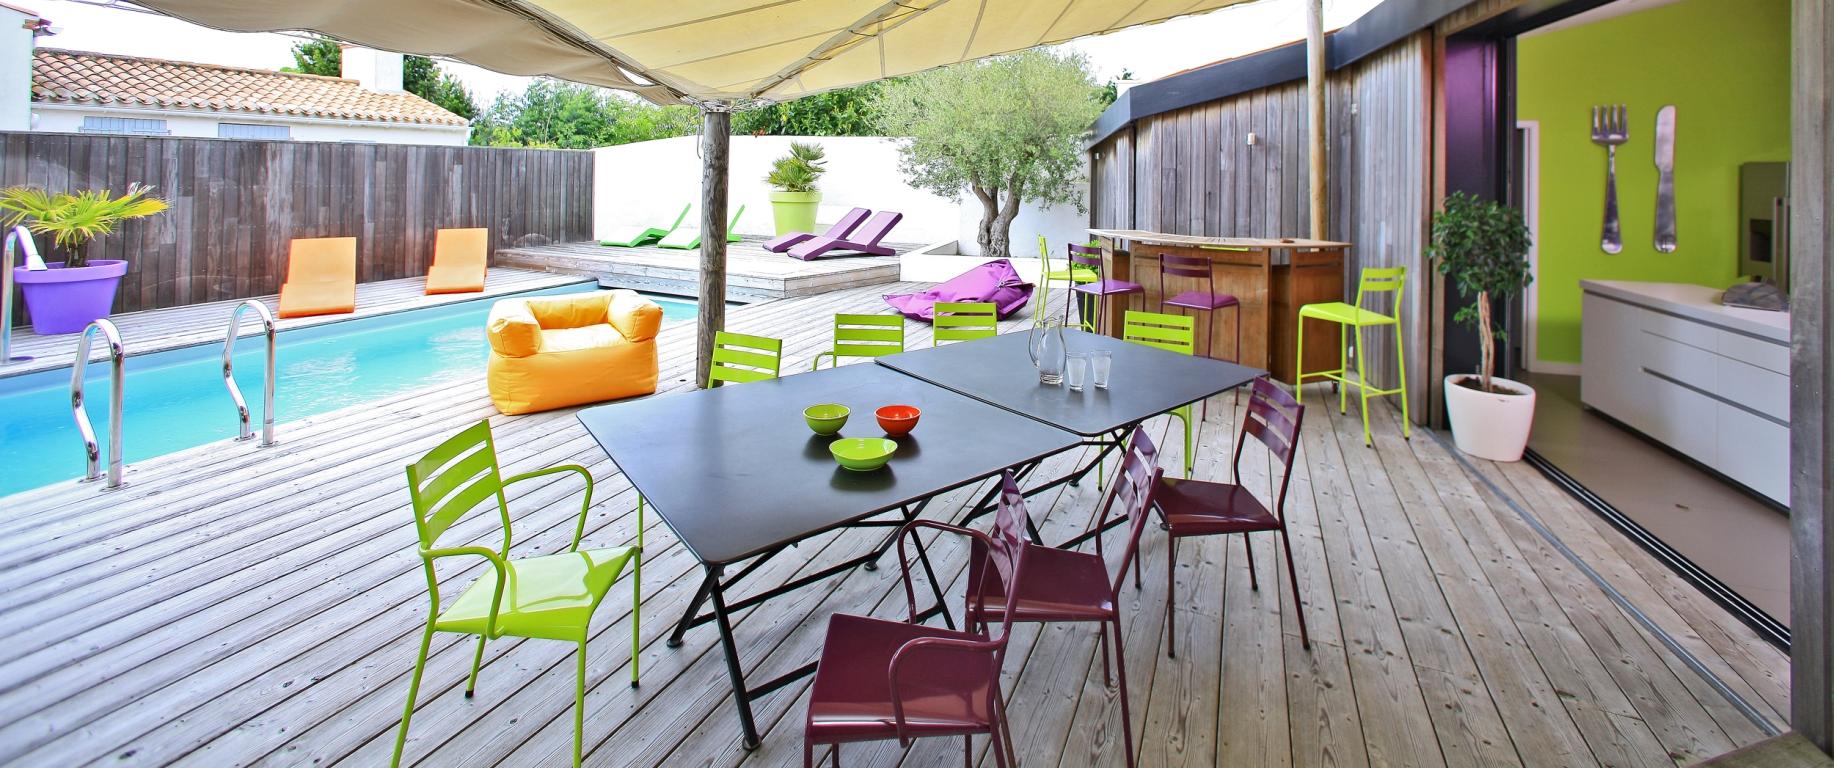 terrasse piscine chauffée magnapool